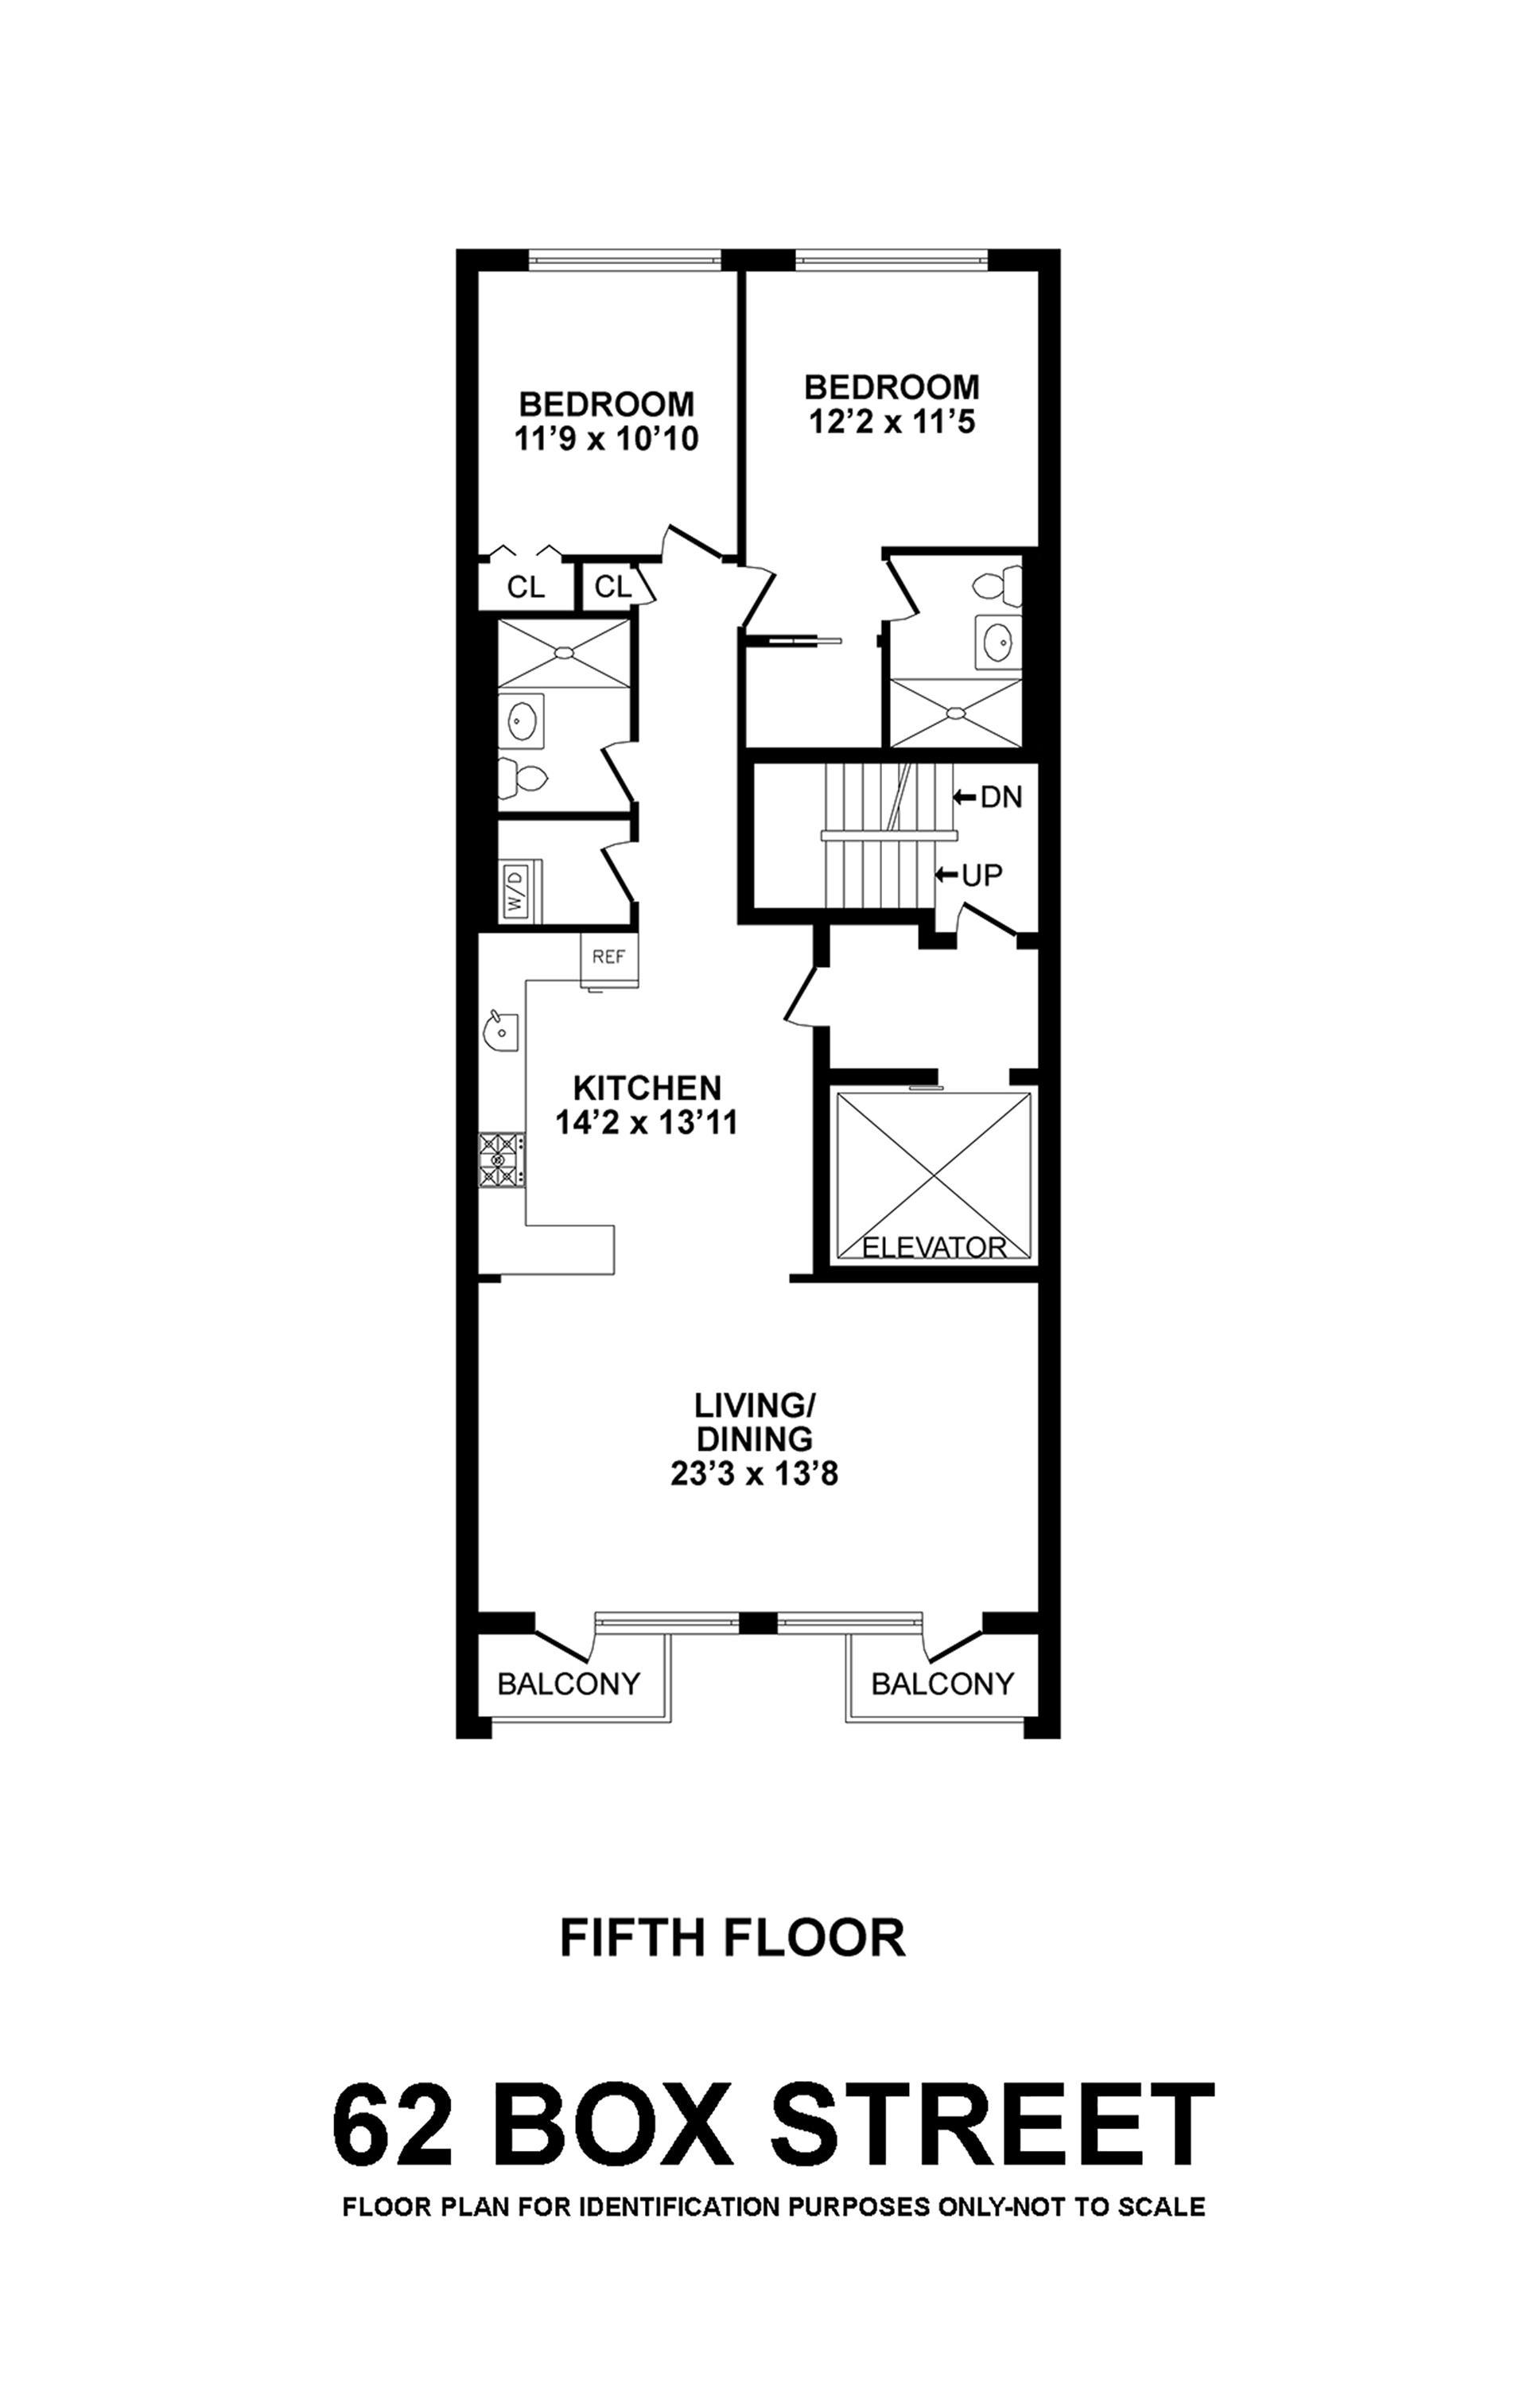 Floor plan of 62 Box St, 5 - Greenpoint, New York